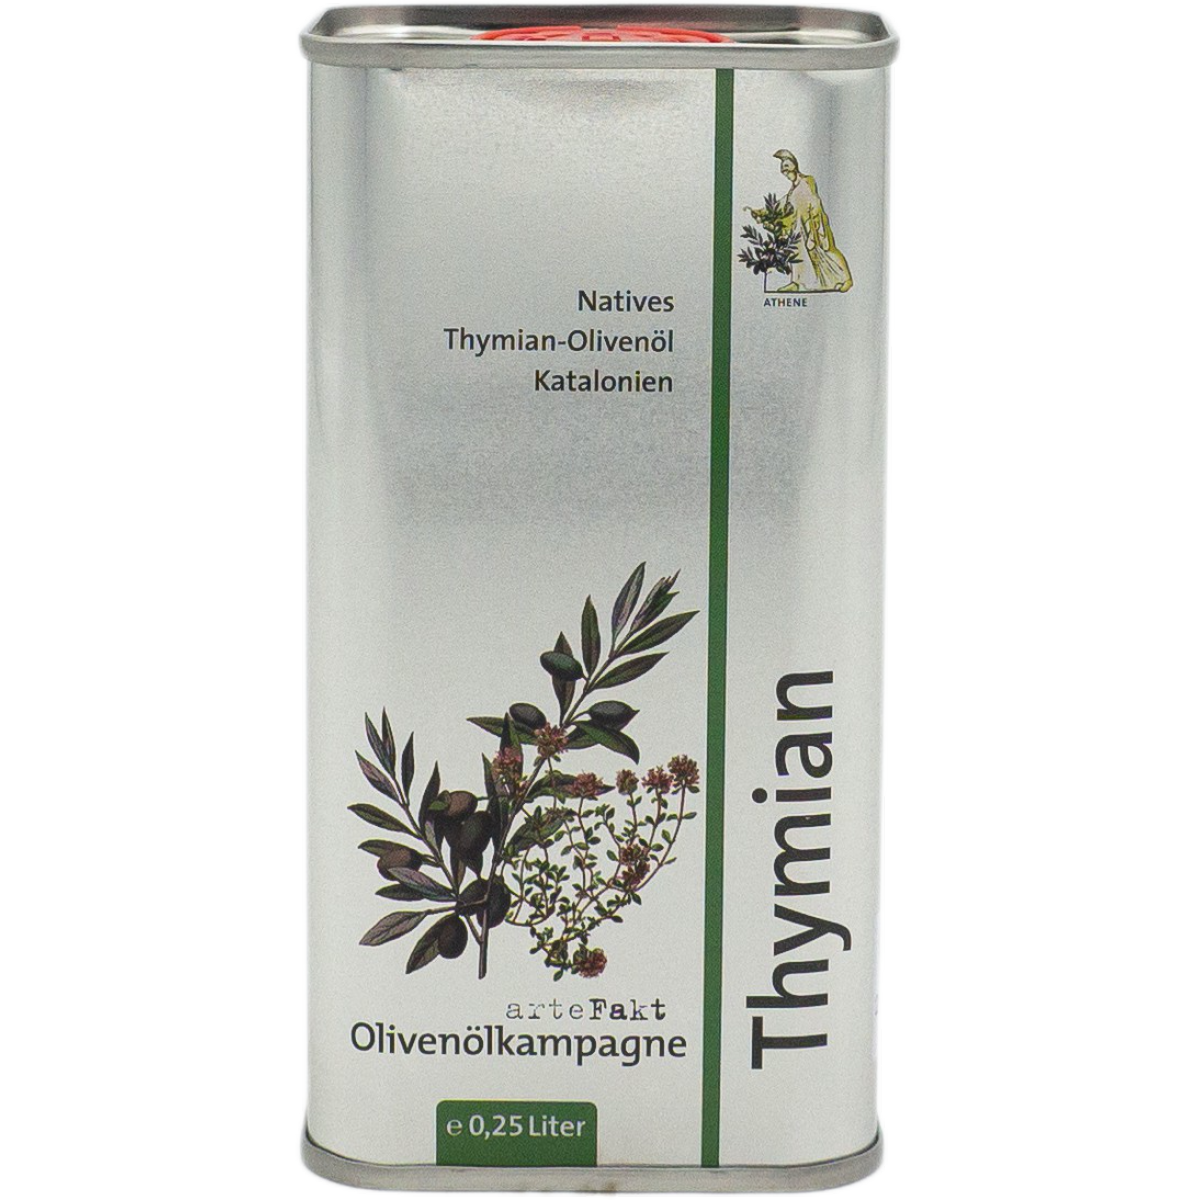 Bio Thymian Olivenöl, nativ